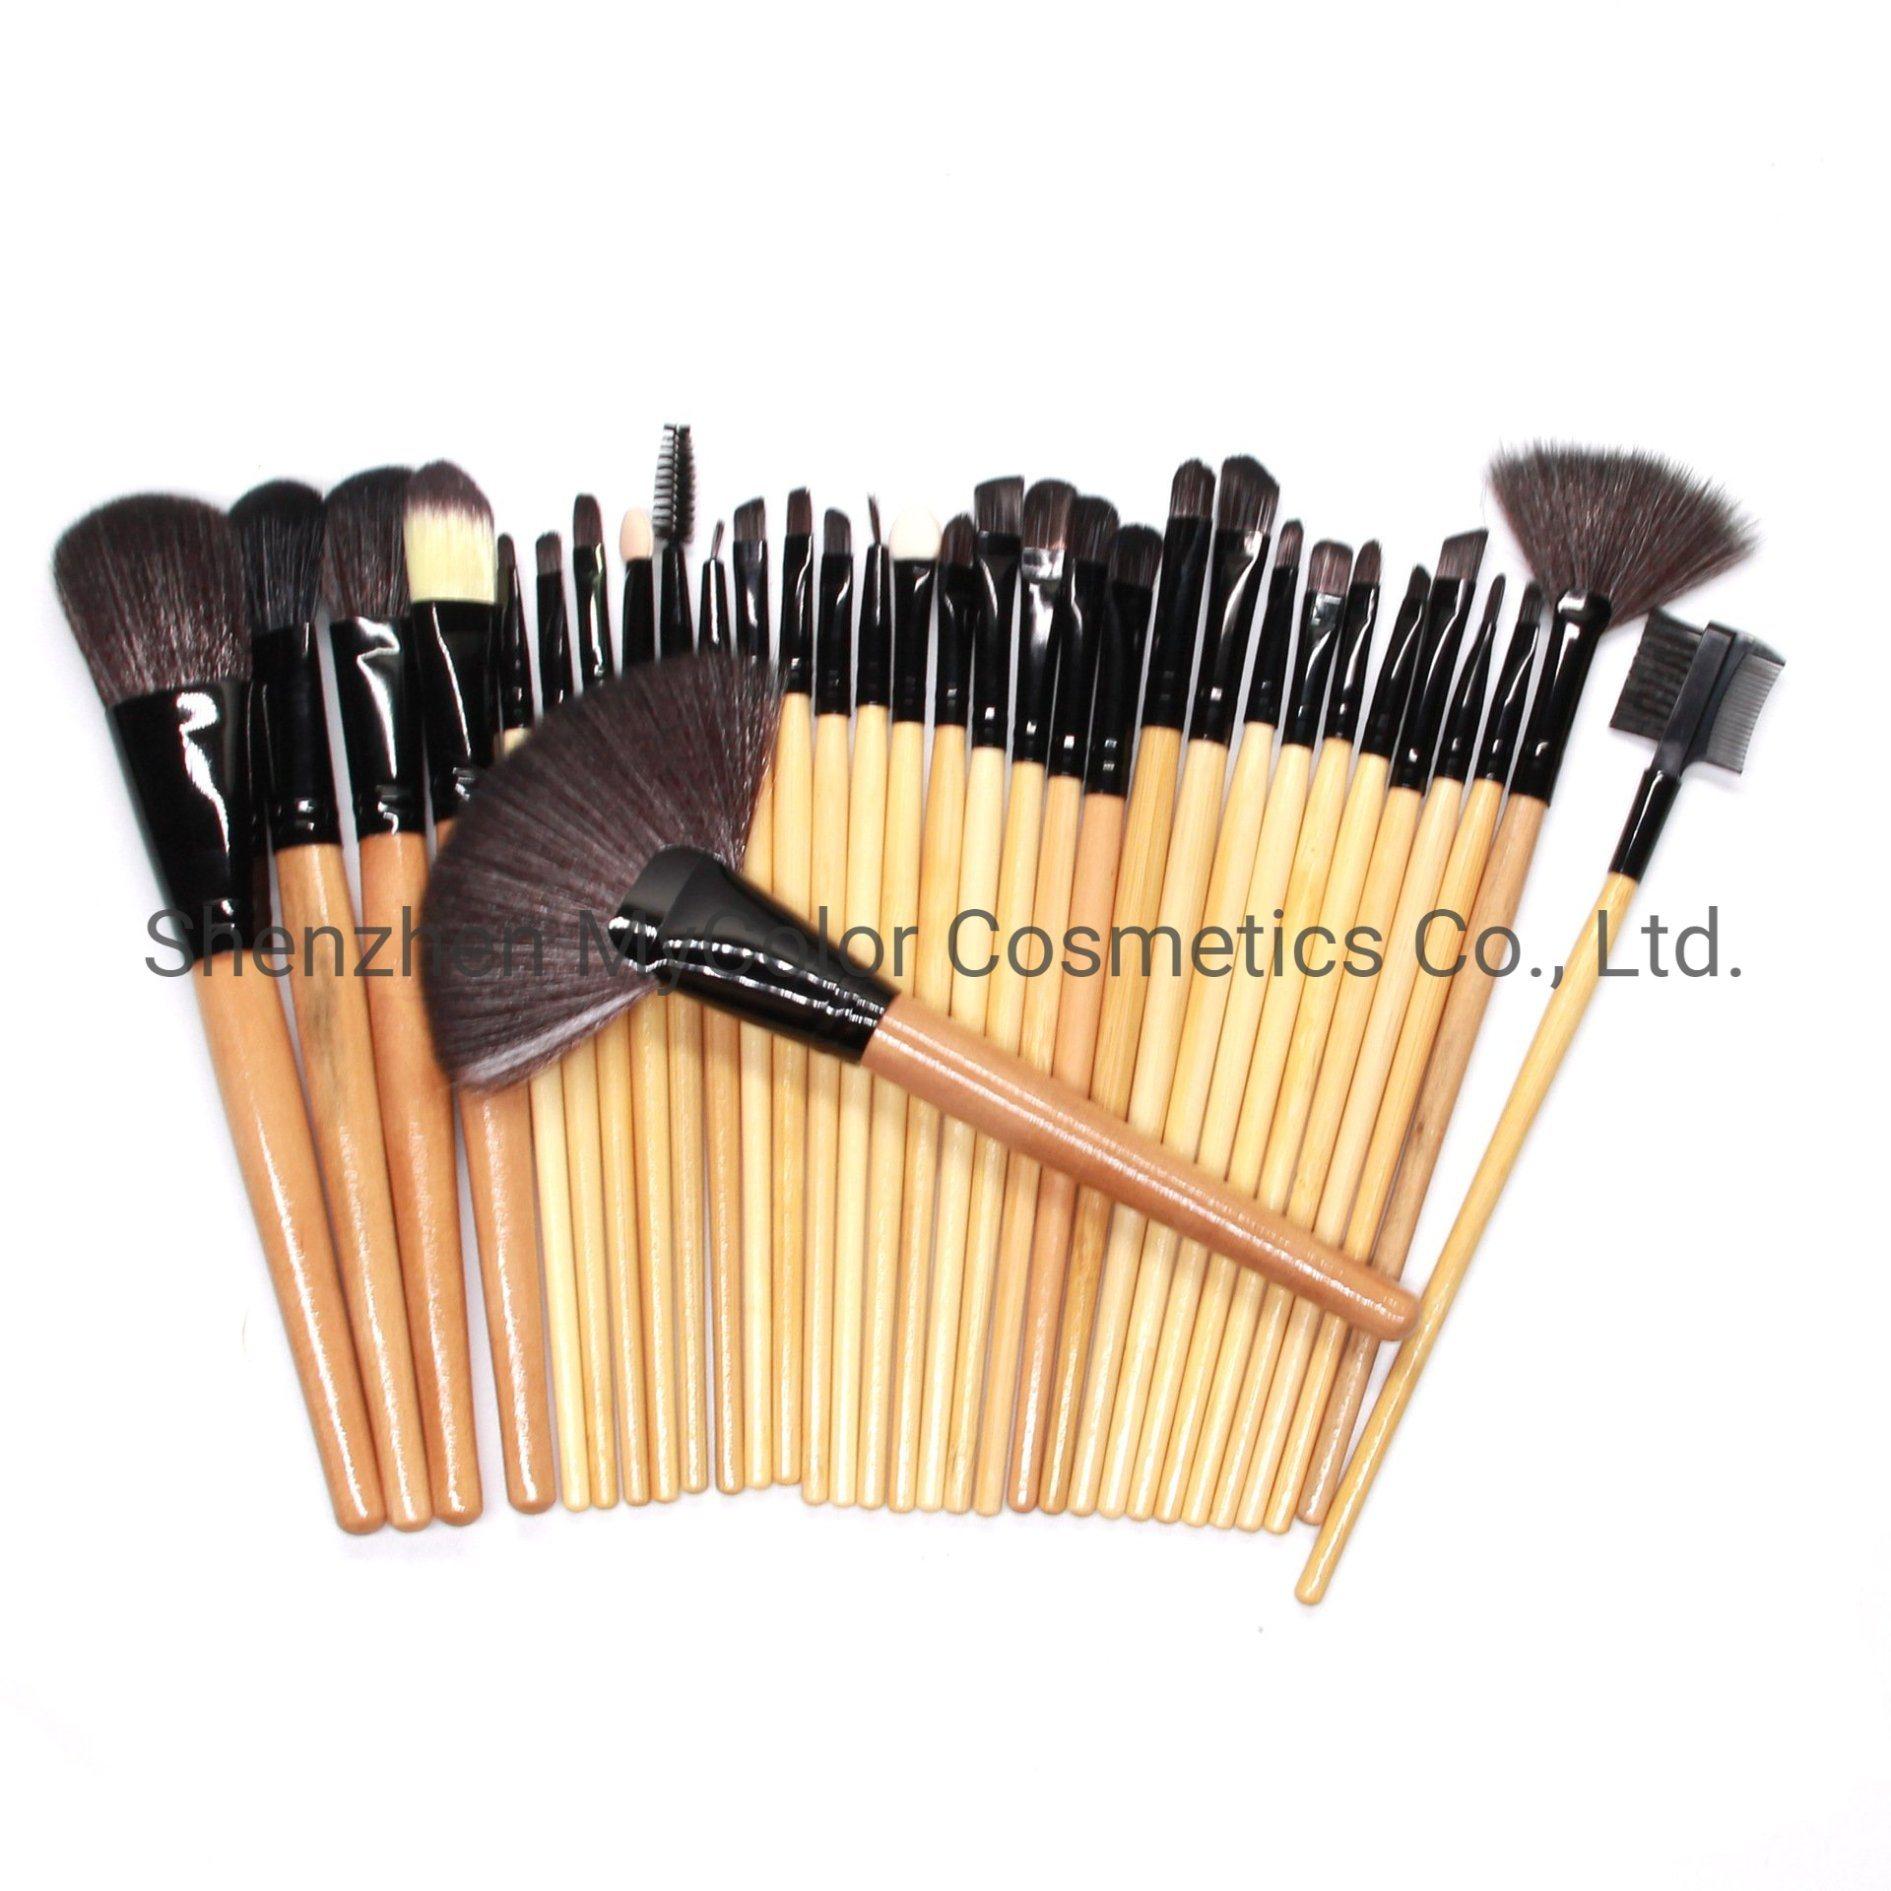 China Professional Vegan Makeup Brush